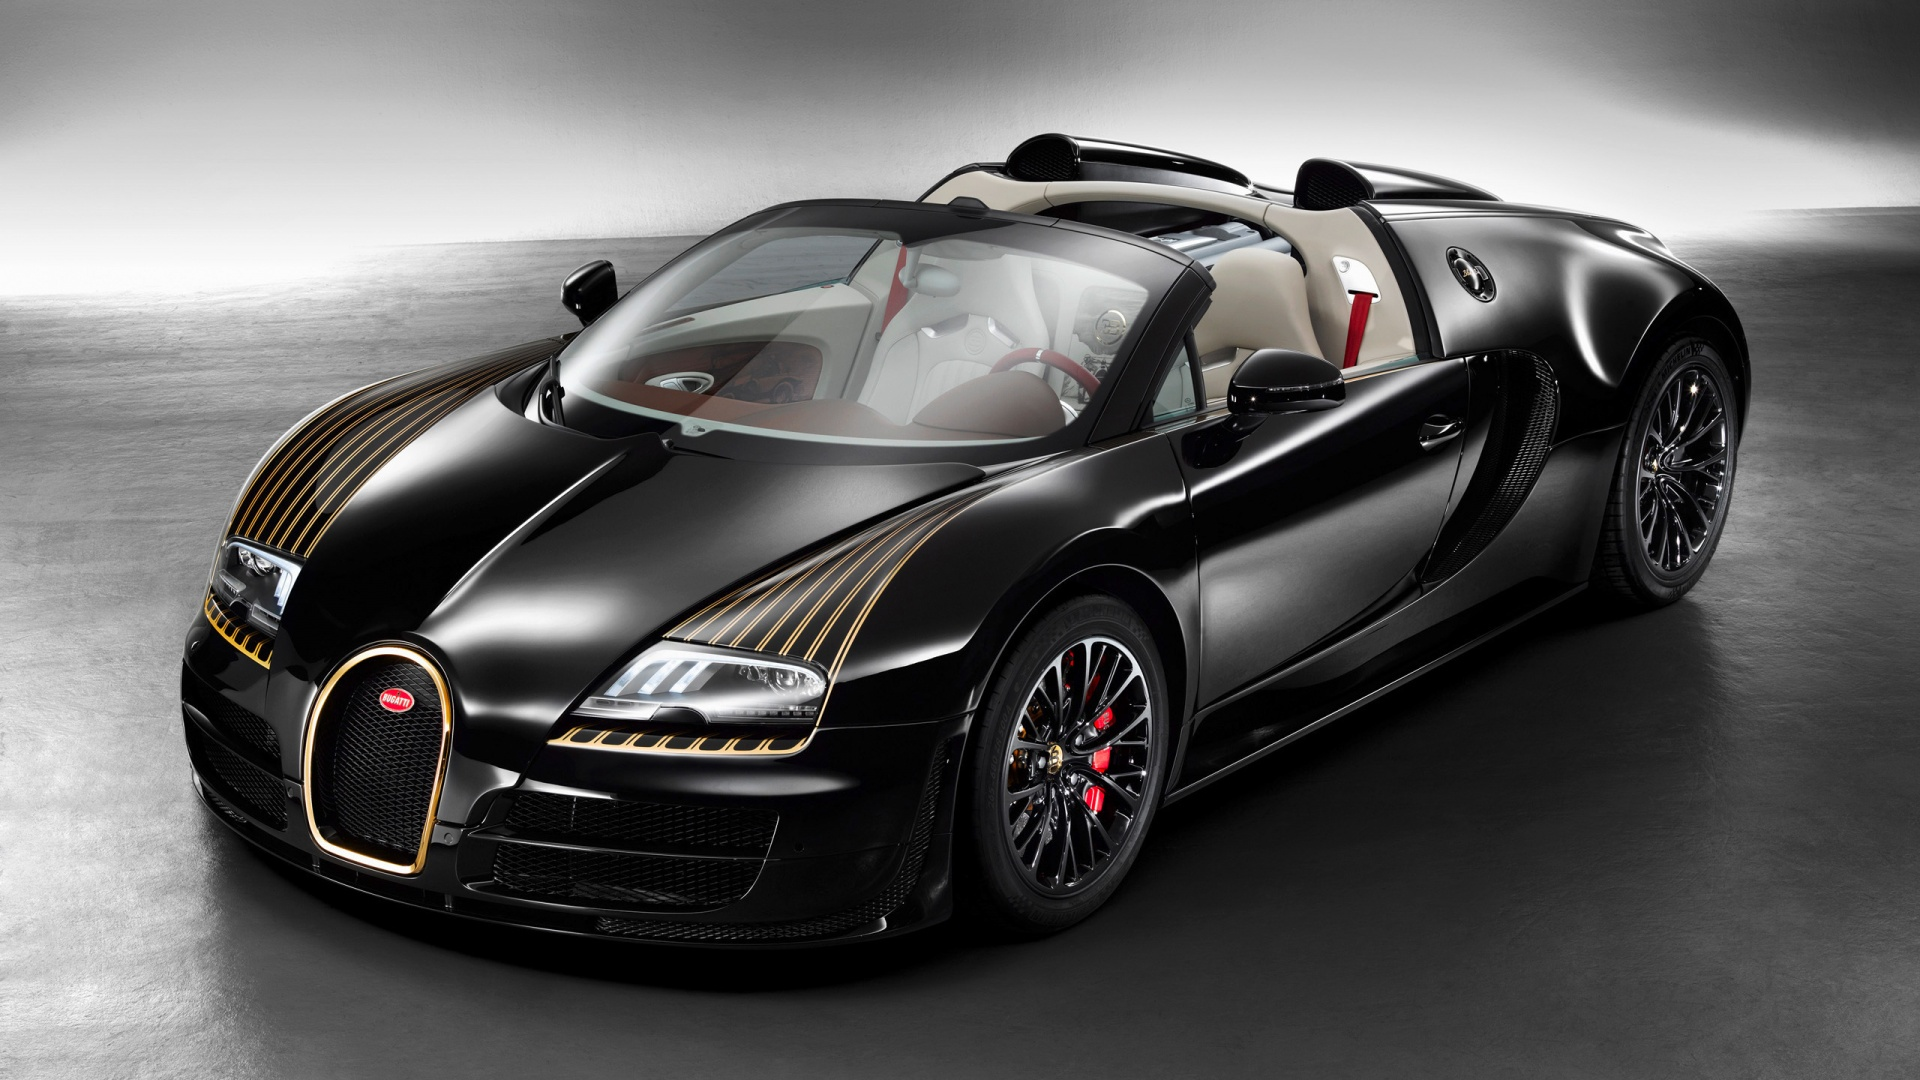 bugatti veyron wallpapers impressive